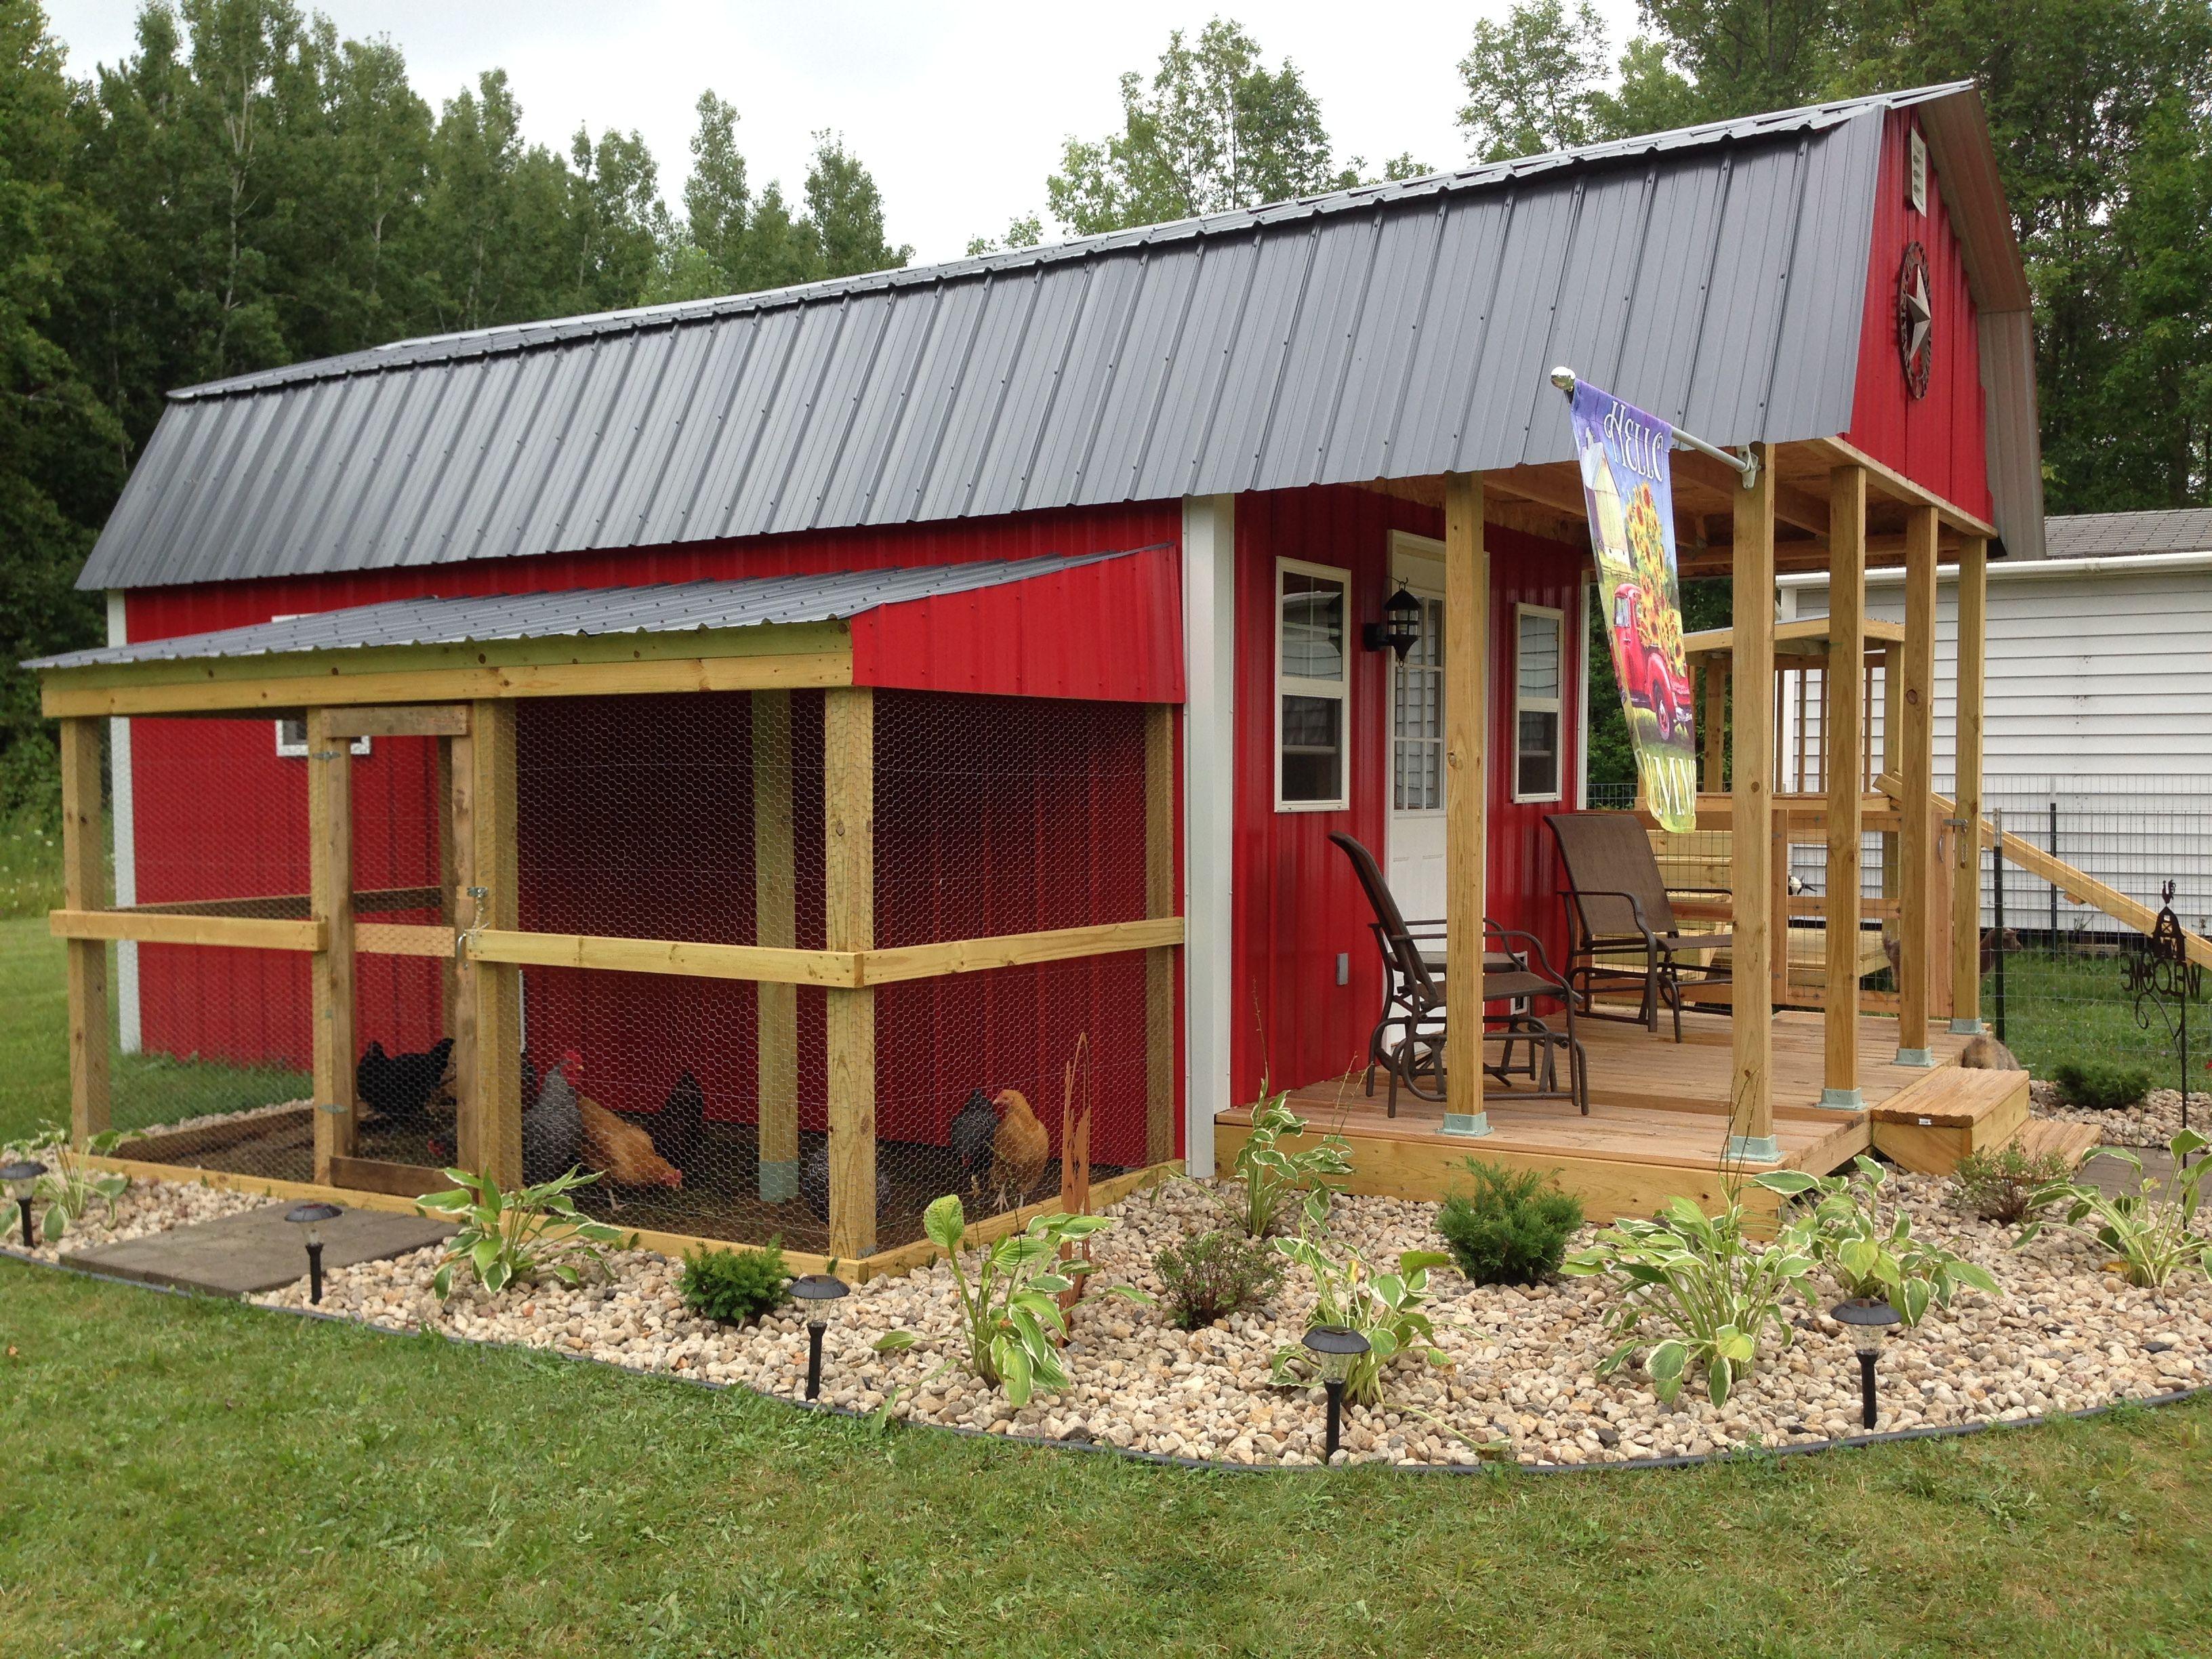 Mini Barn On Our Hobby Farm Farm Layout Chicken Coop Plans Chicken Barn